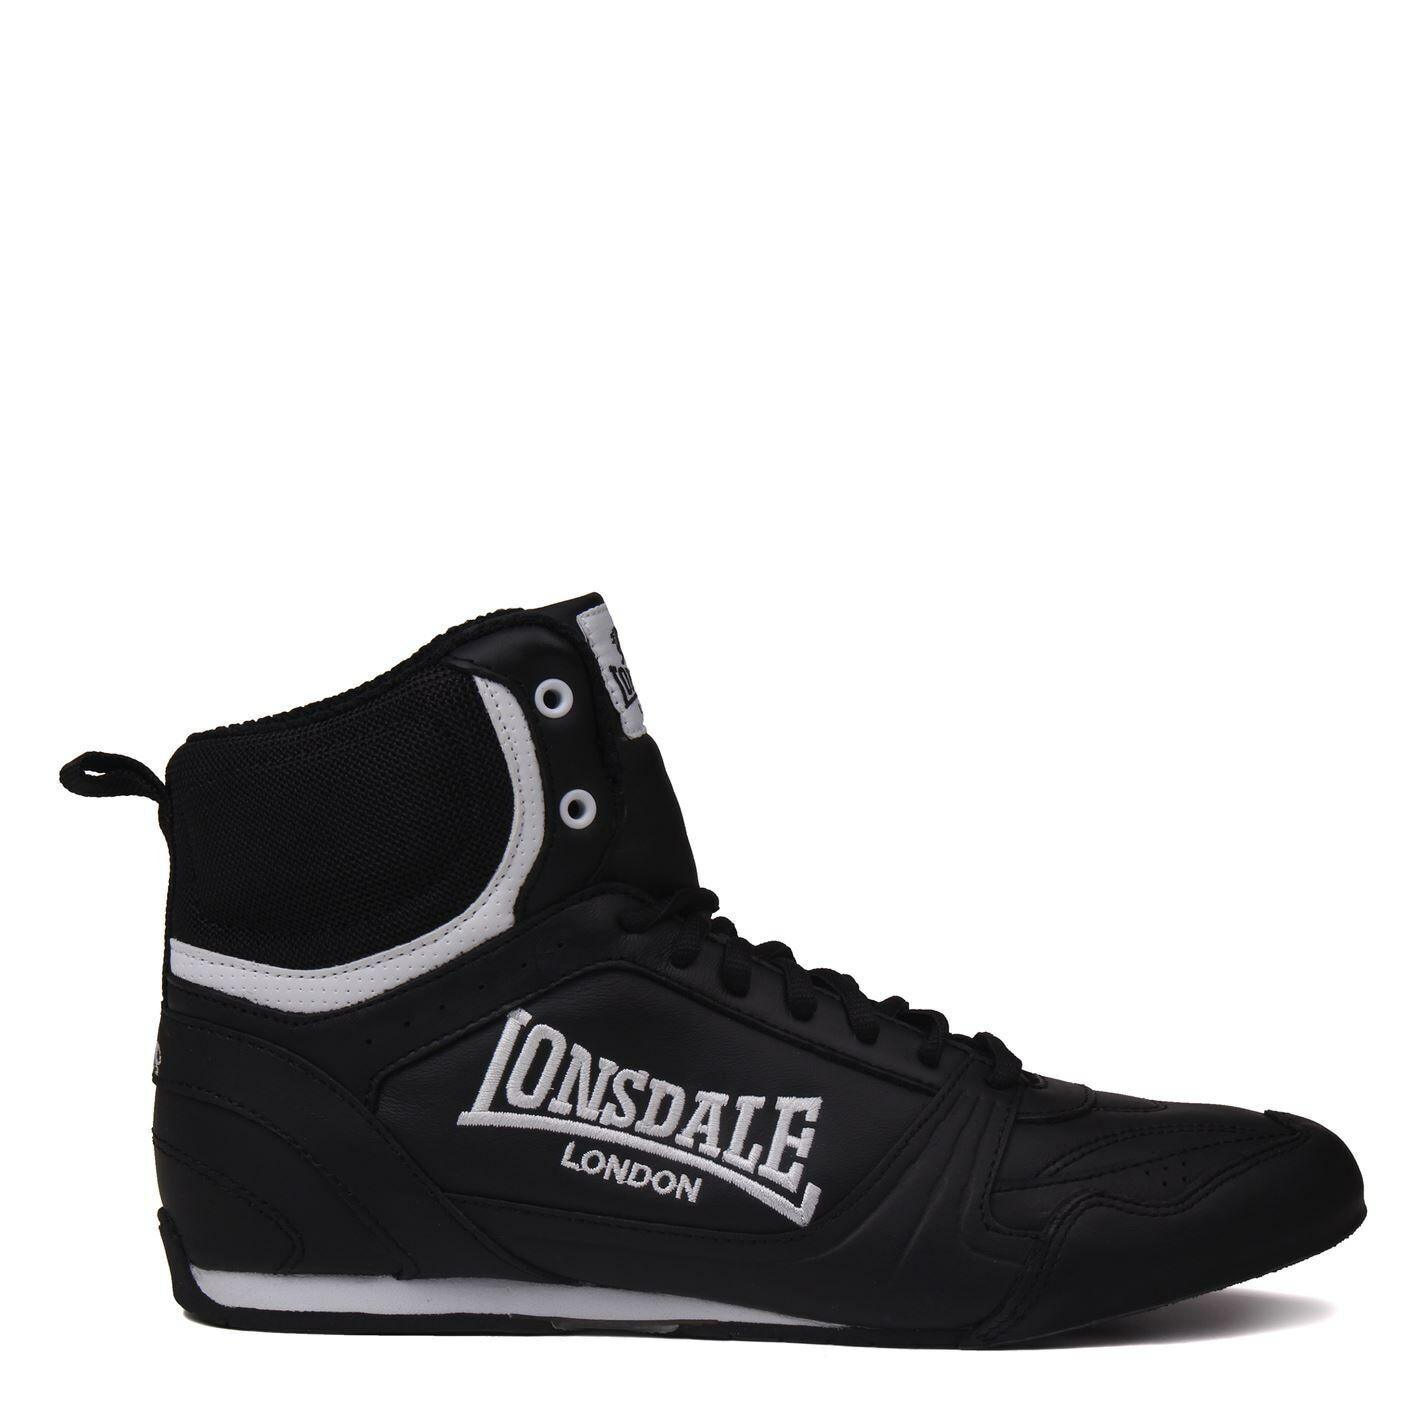 Lonsdale Ανδρικά Παπούτσια Πυγμαχίας